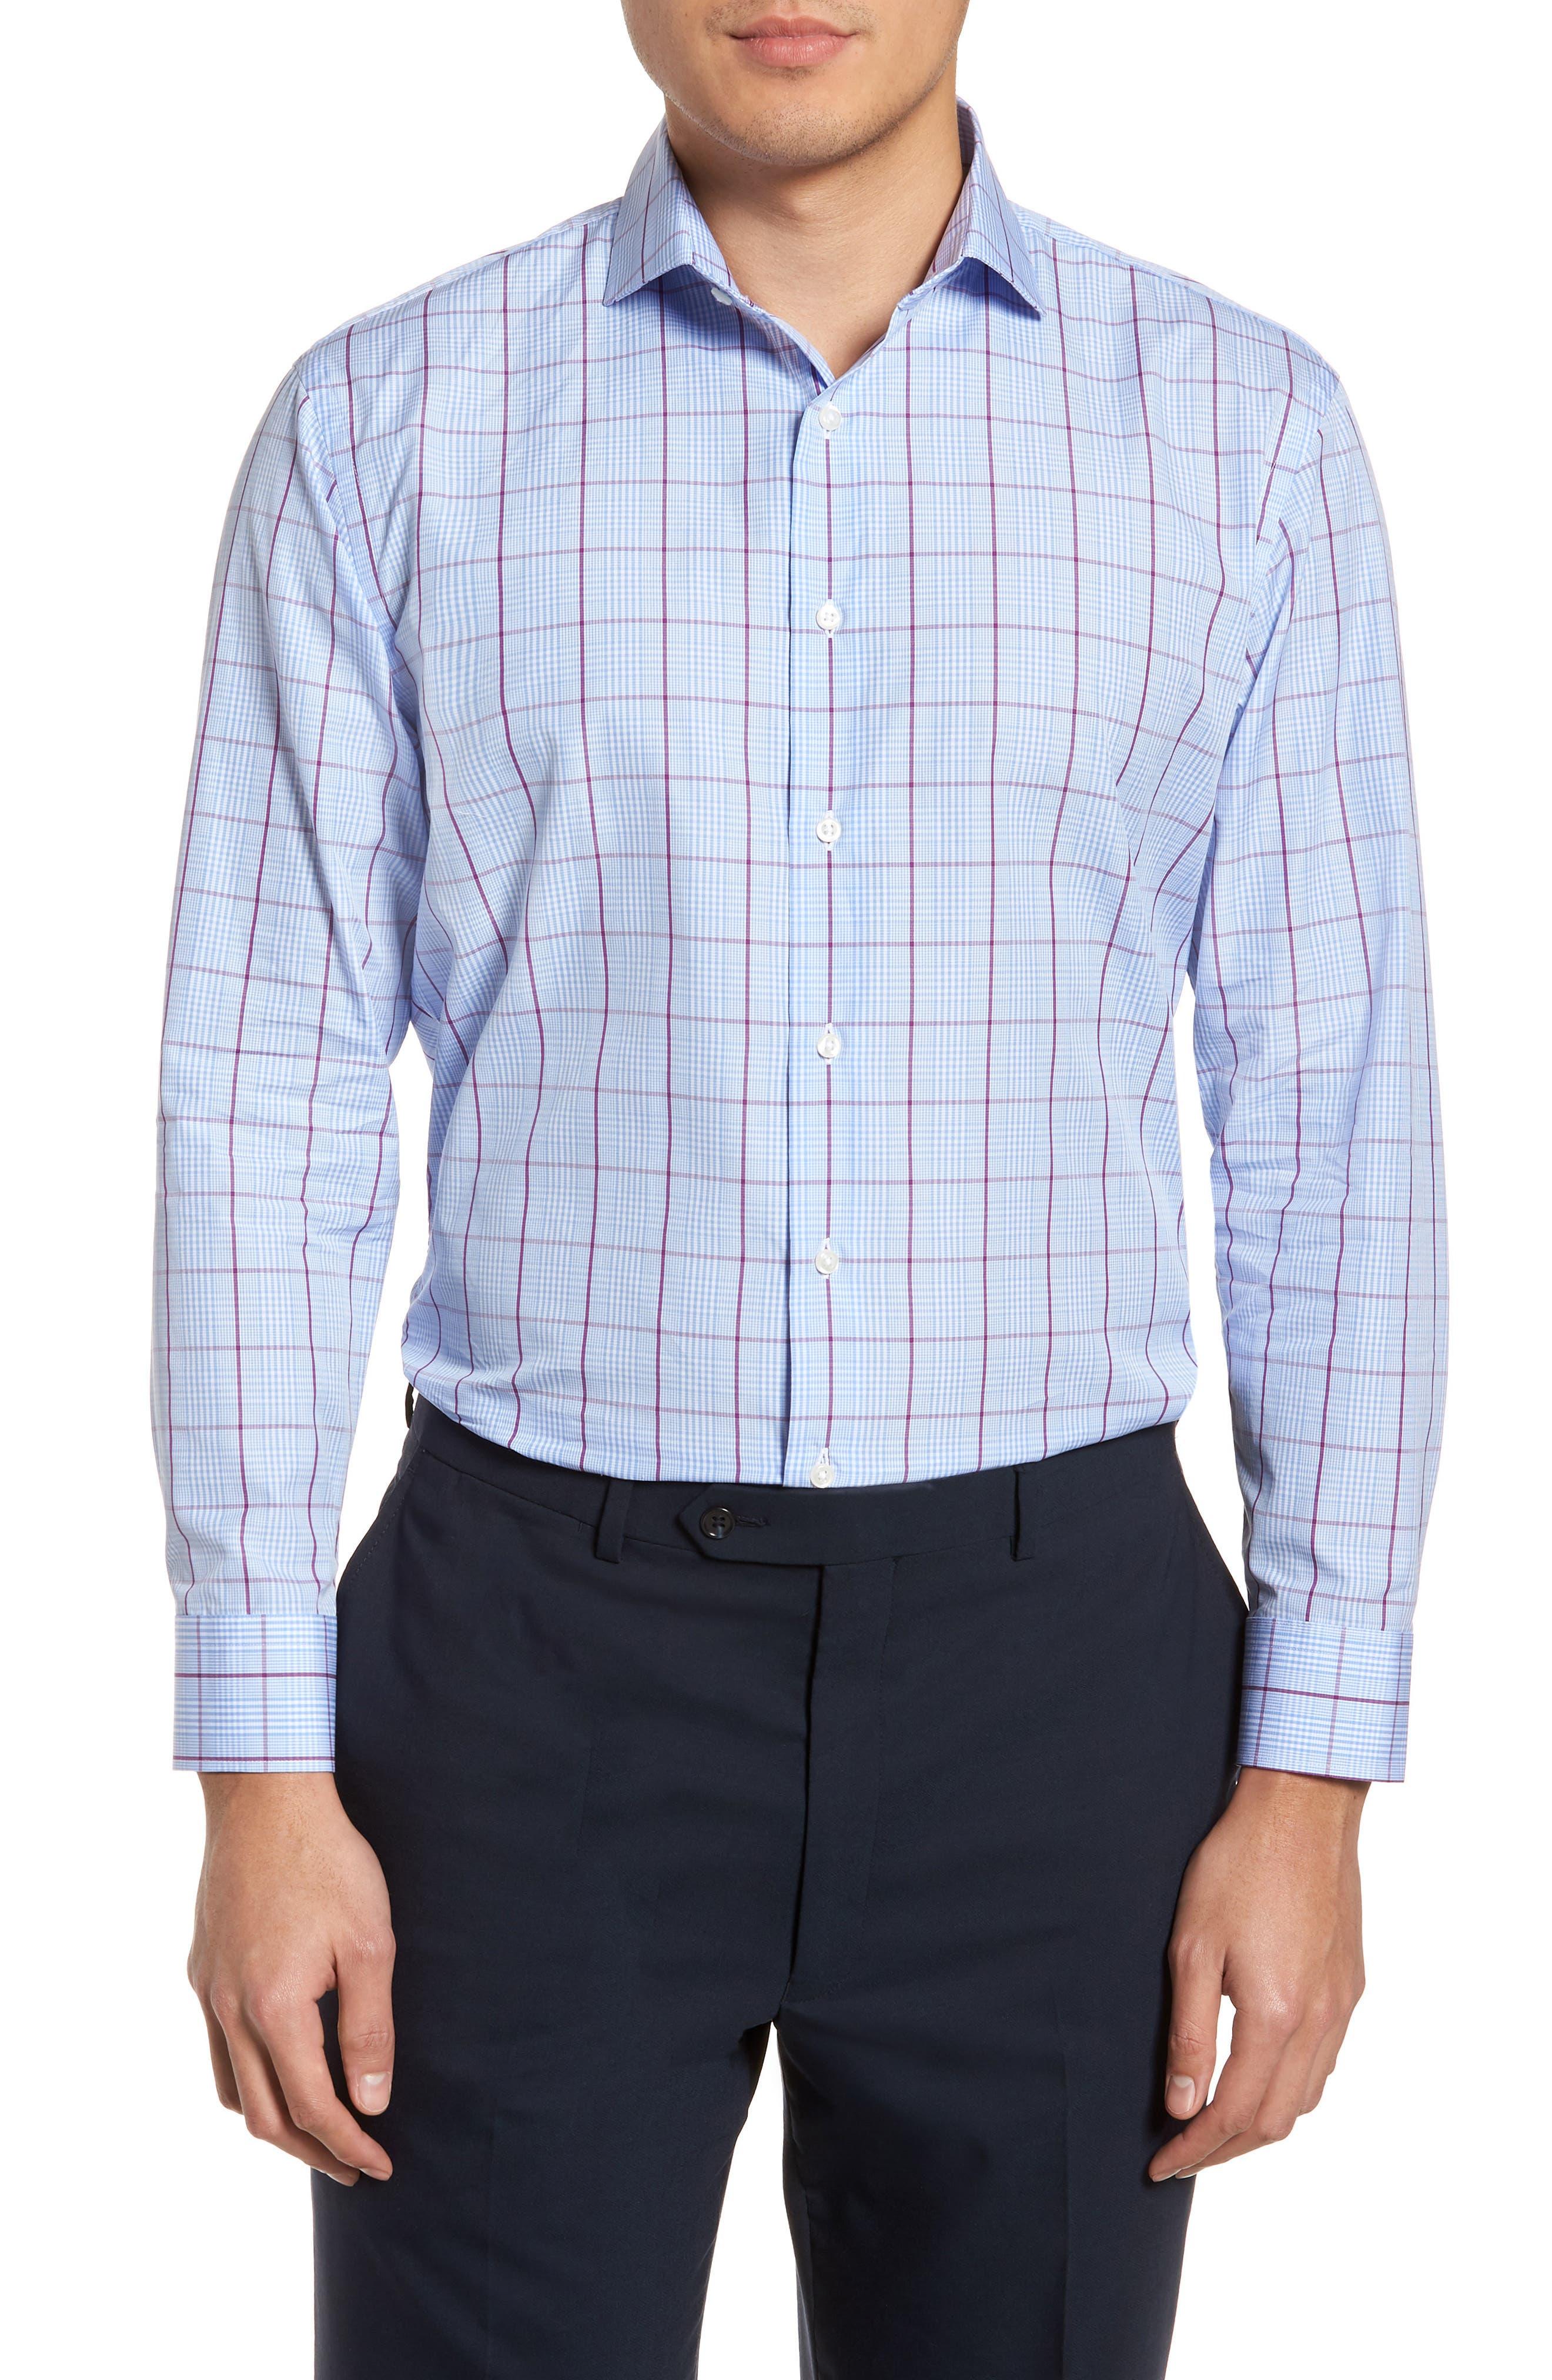 Alternate Image 1 Selected - Nordstrom Men's Shop Trim Fit Plaid Dress Shirt